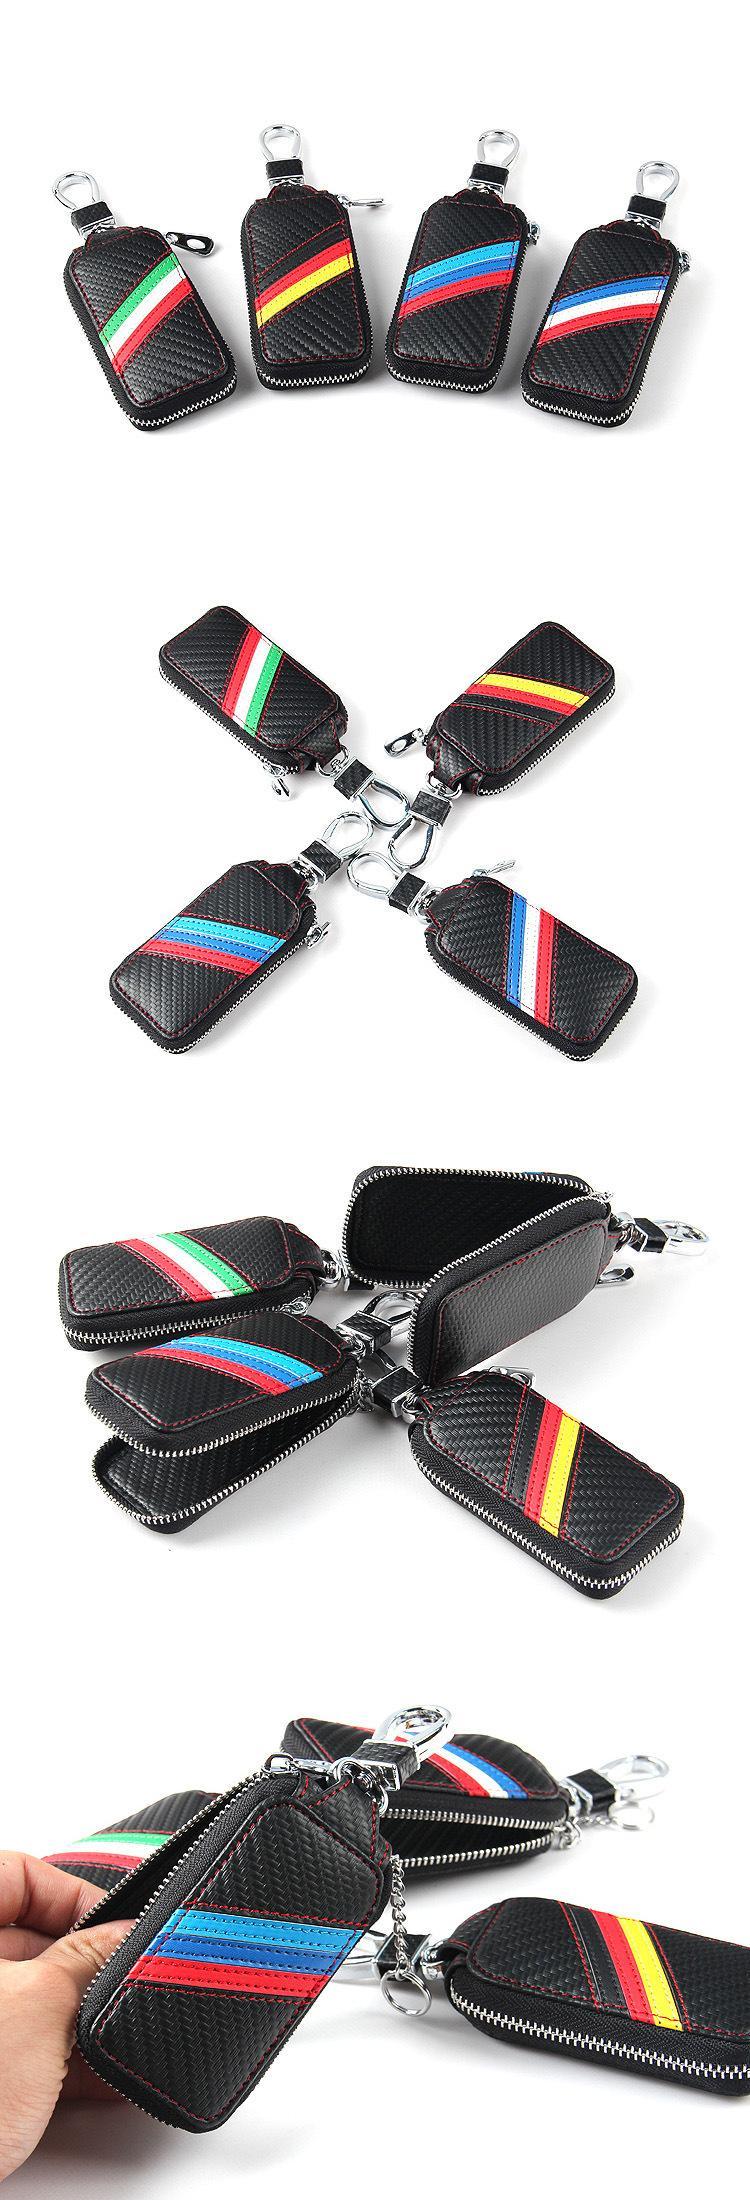 Carbon Fiber Leather Car Key For Bmw Wallet Key 3 4 5 6 7 Series